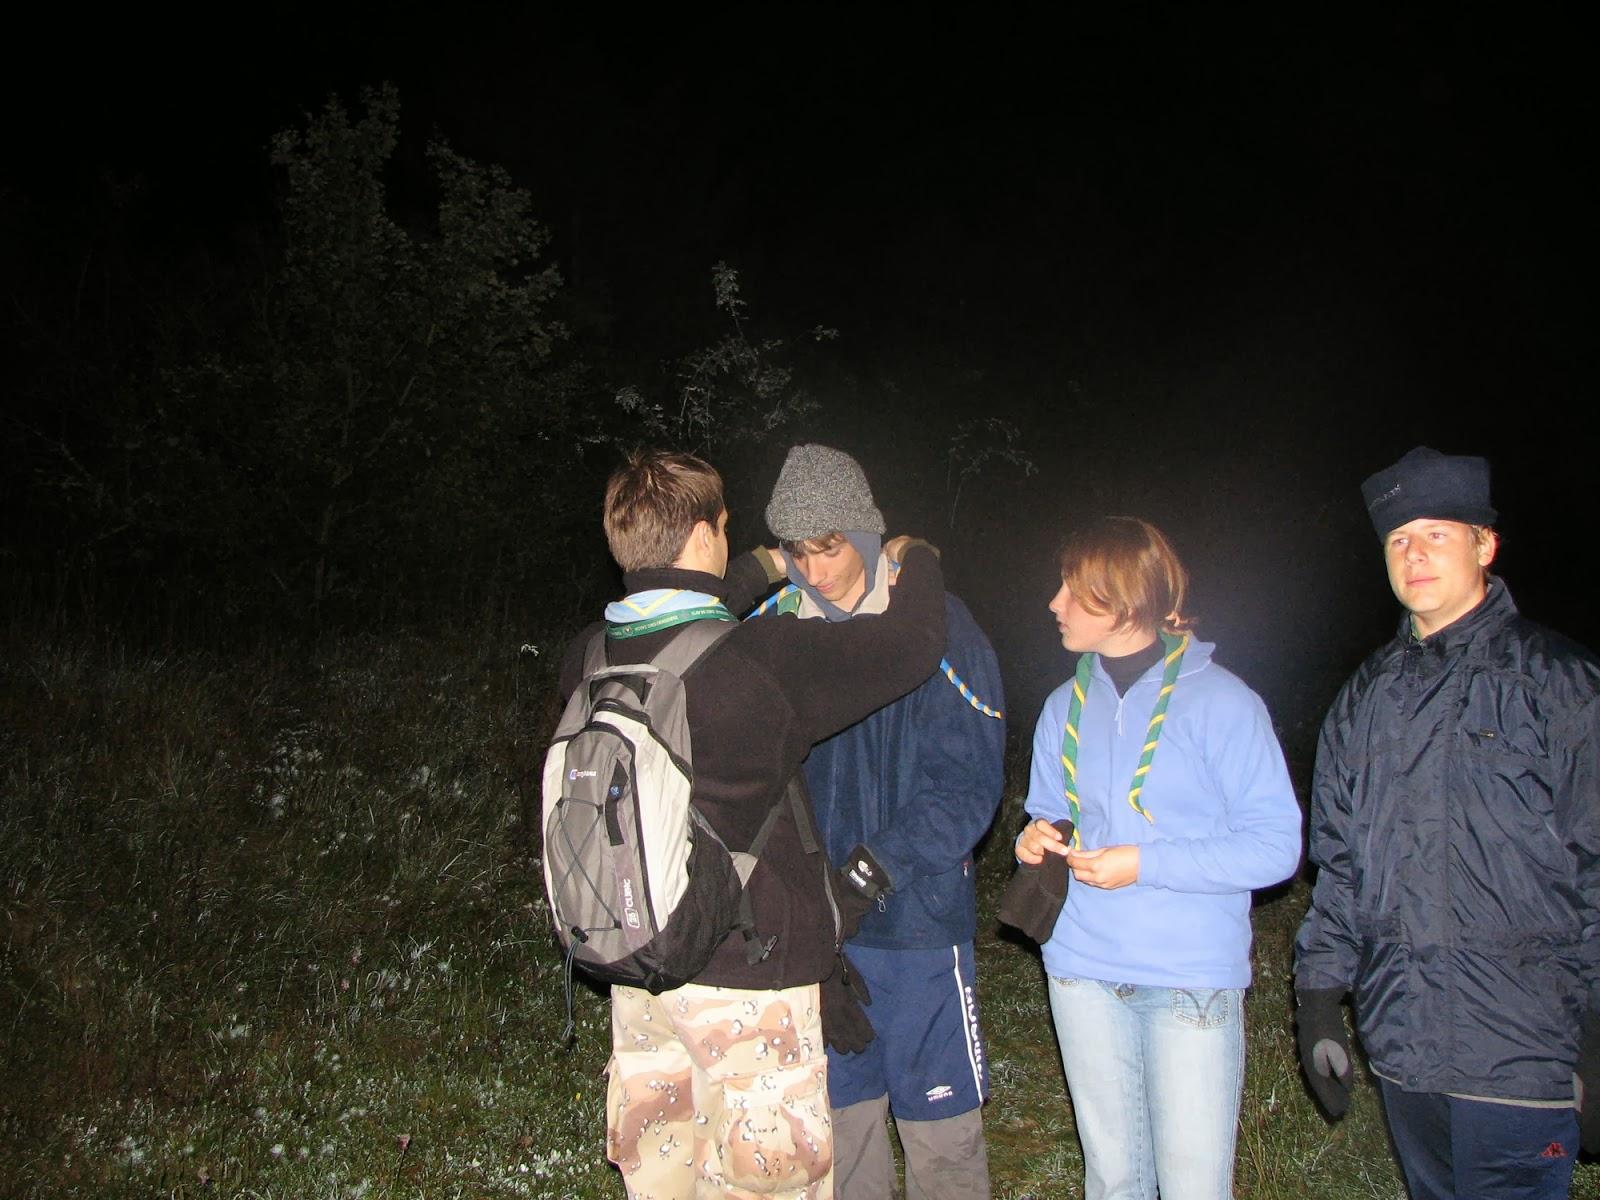 Prehod PP, Ilirska Bistrica 2005 - picture%2B077.jpg